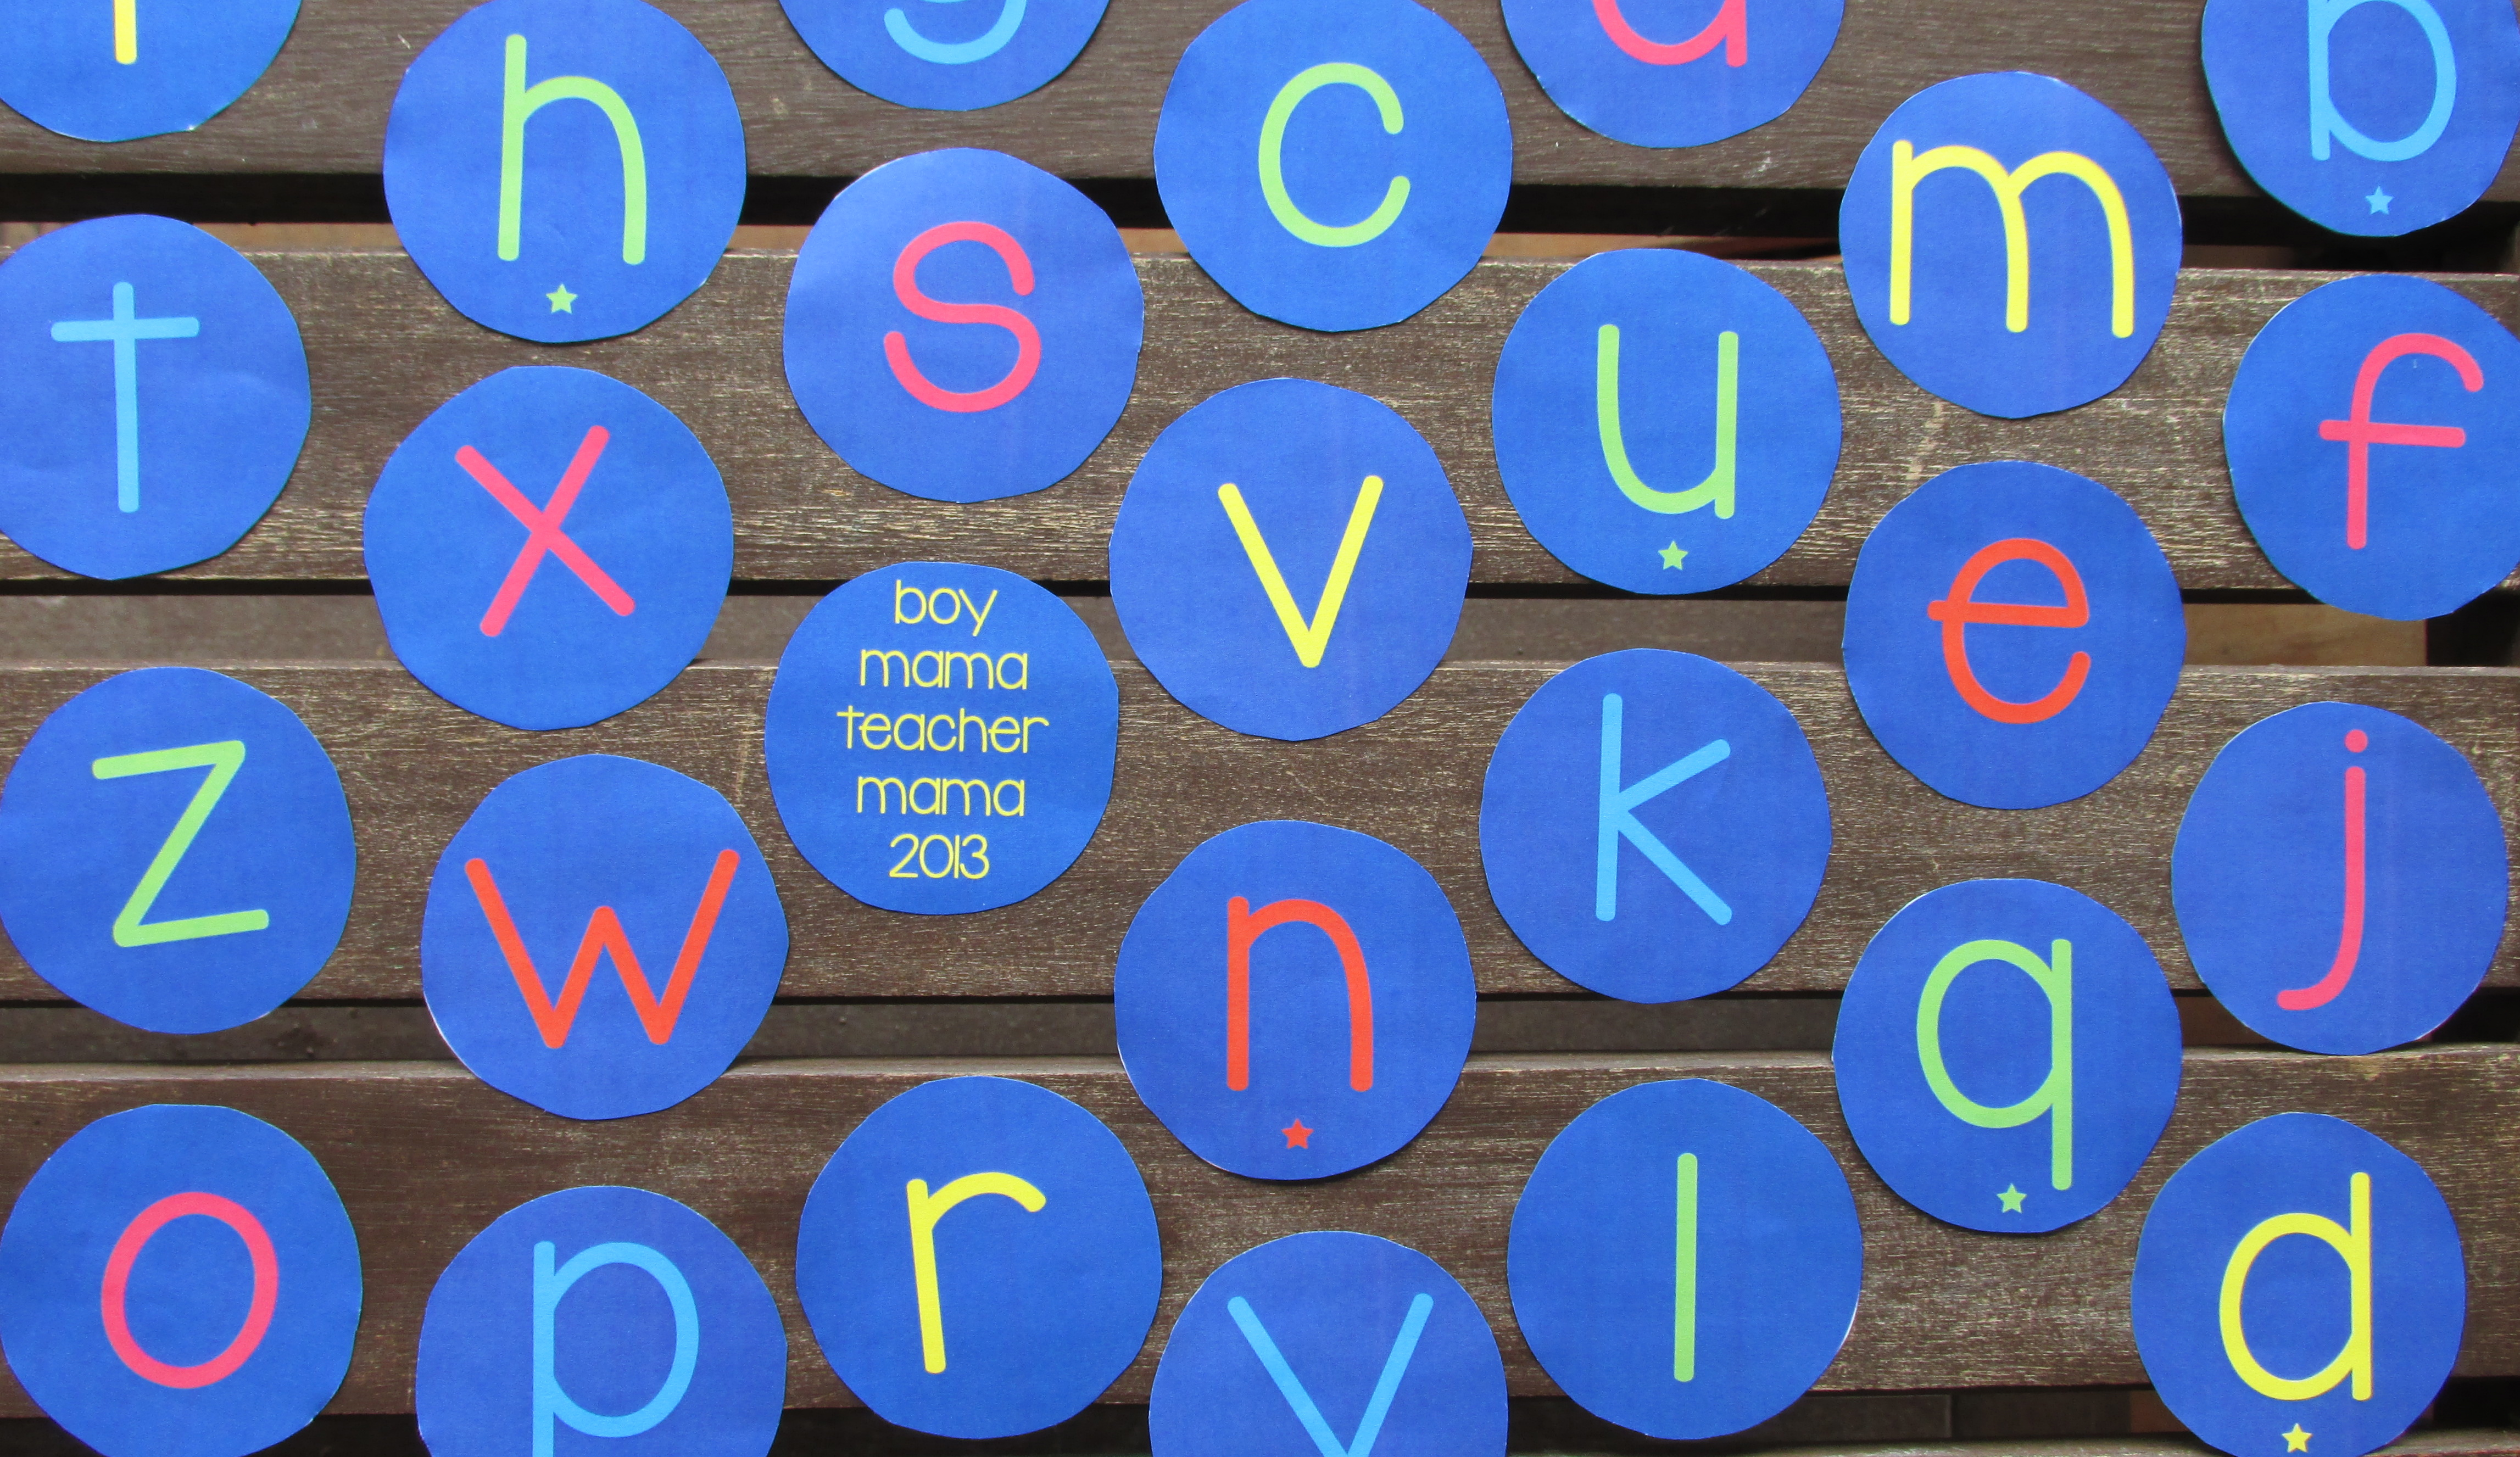 Teacher Mama Teaching Vowels And Consonants To Children